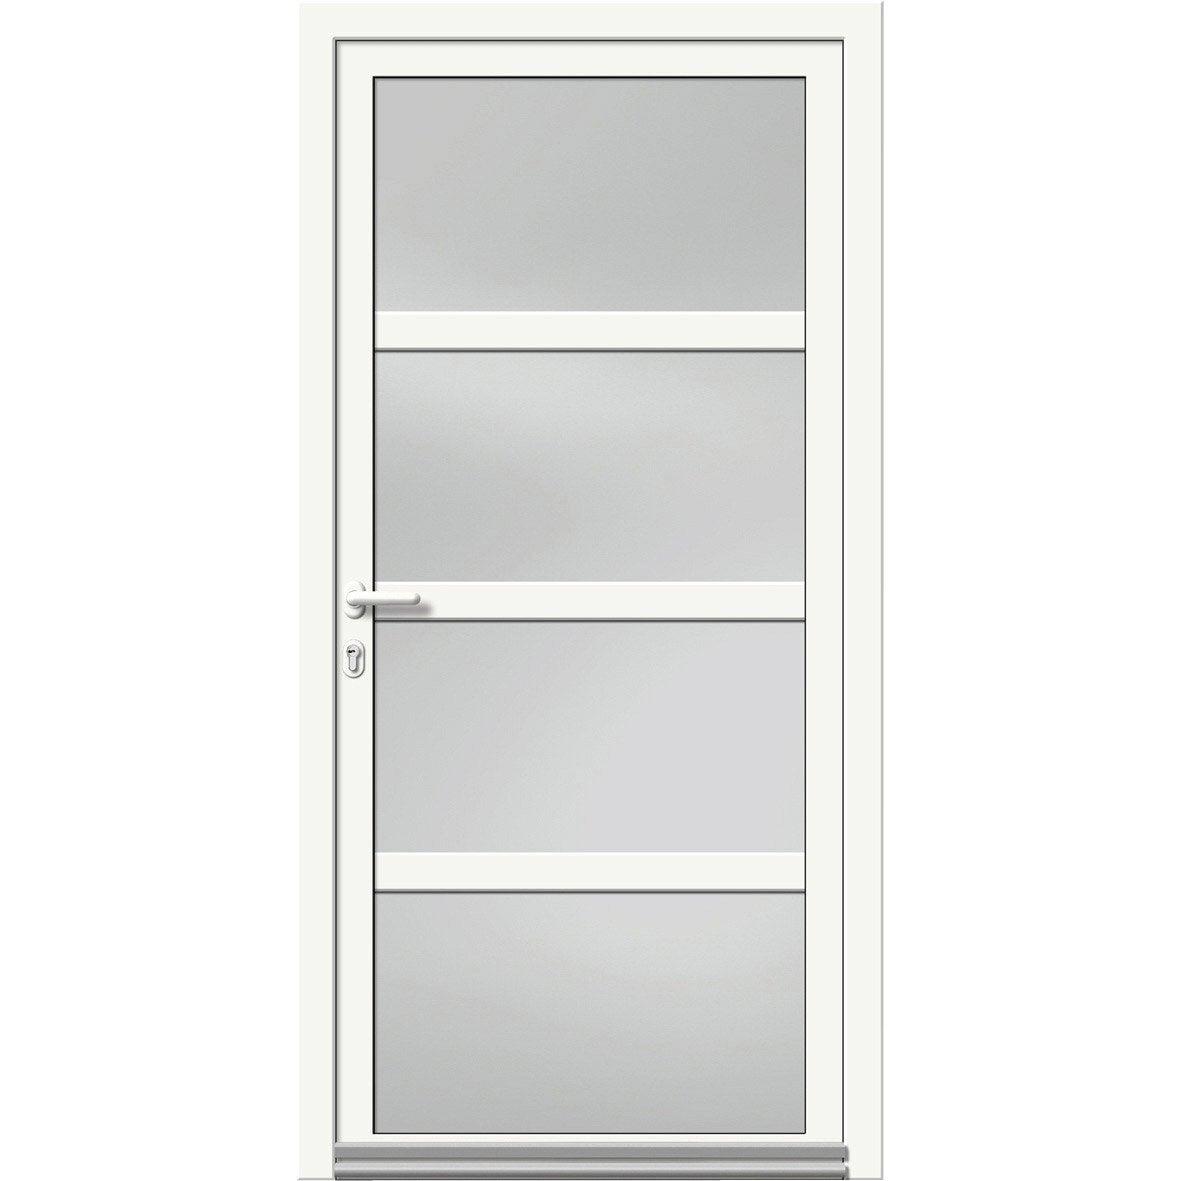 Porte d 39 entr e aluminium nova artens poussant gauche h215 - Porte d entree 200 x 90 ...